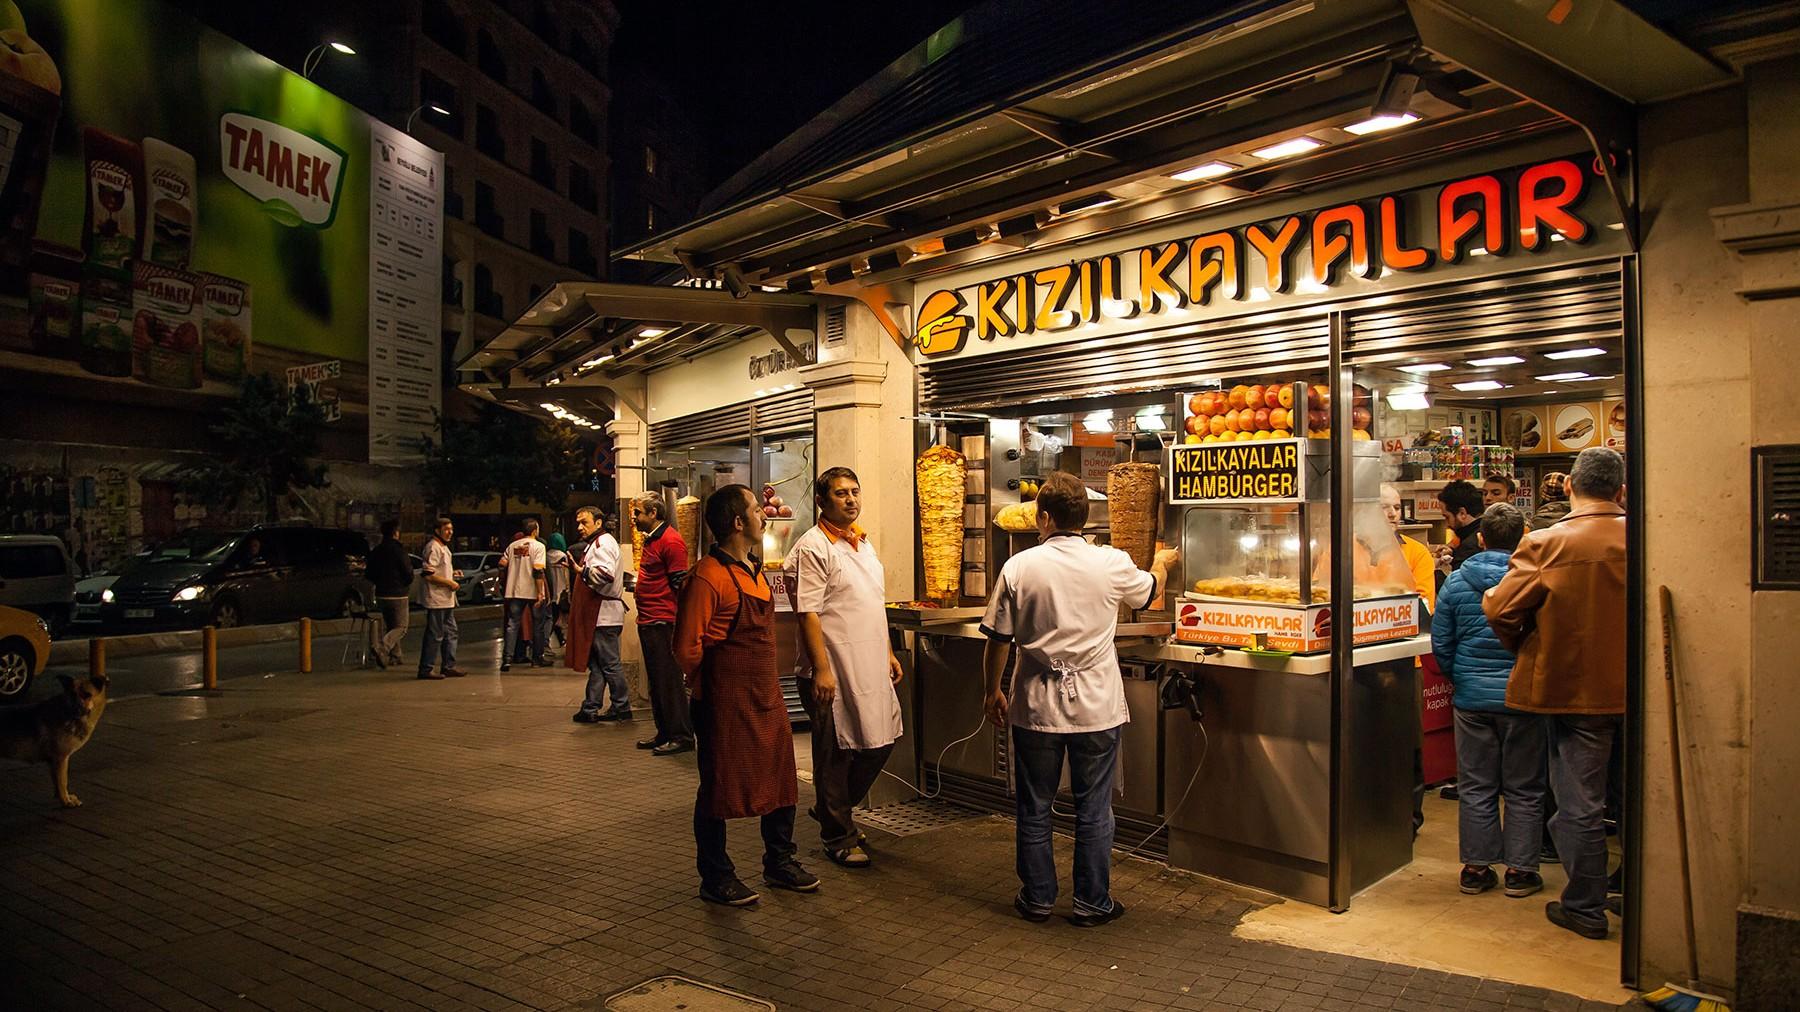 Kizilkaya-Islak-burger-joint-in-Taksim-square